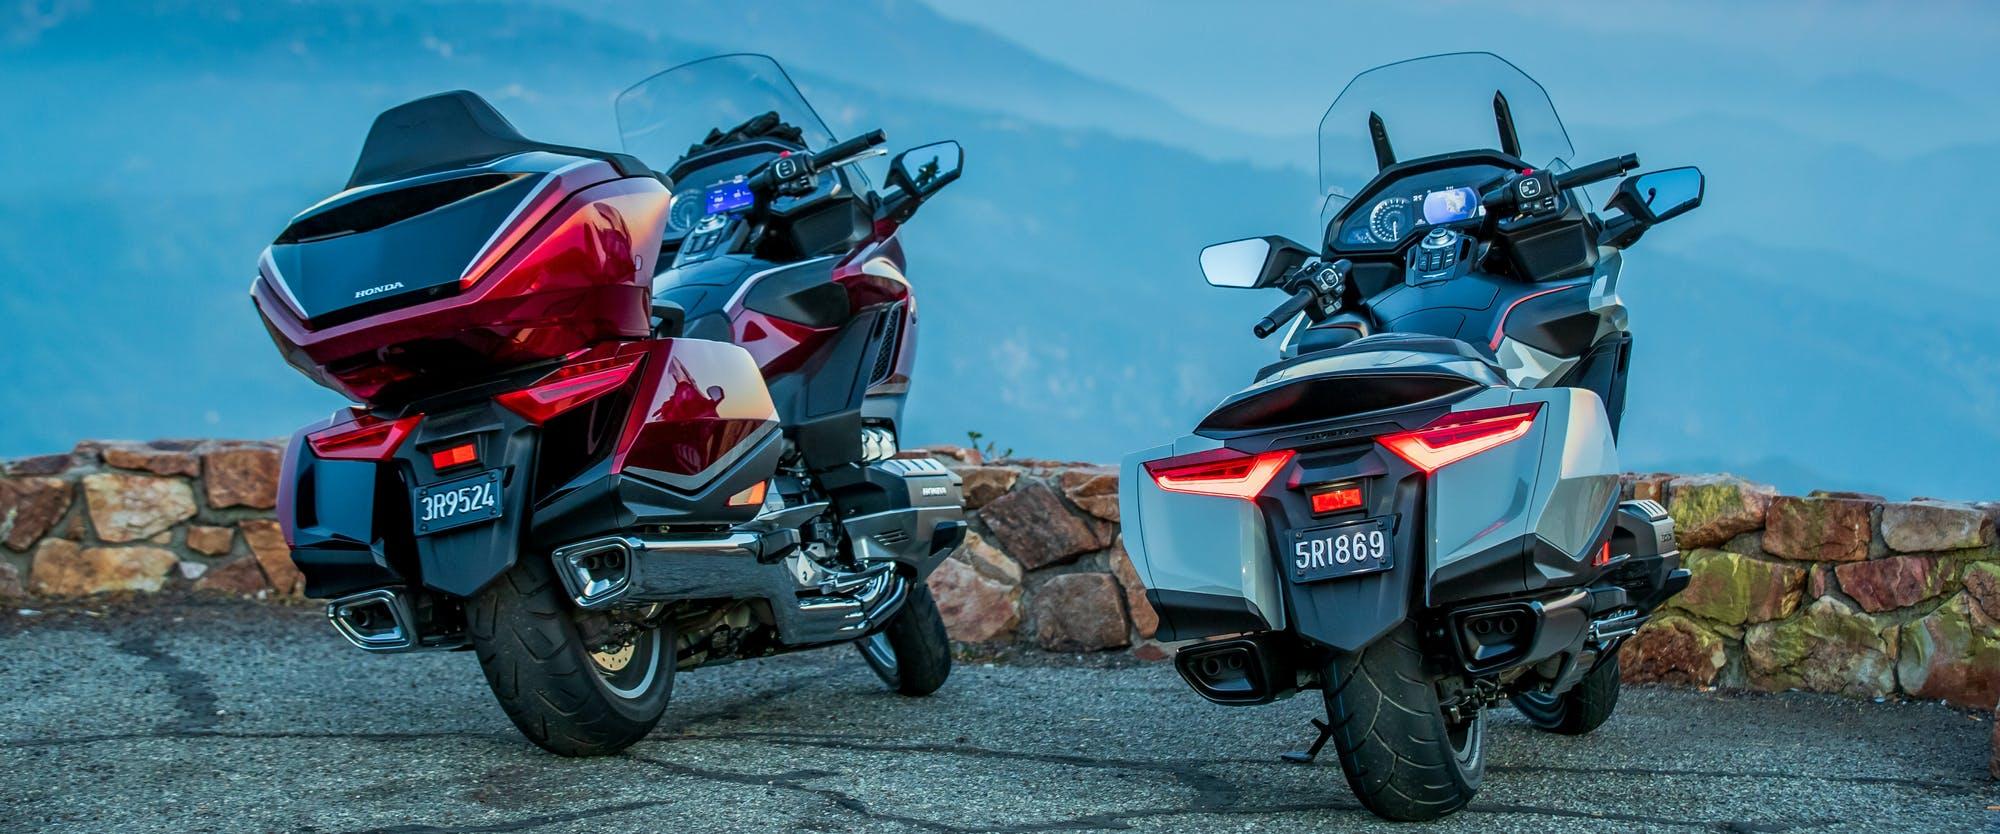 Honda Goldwing Tour Premium parked